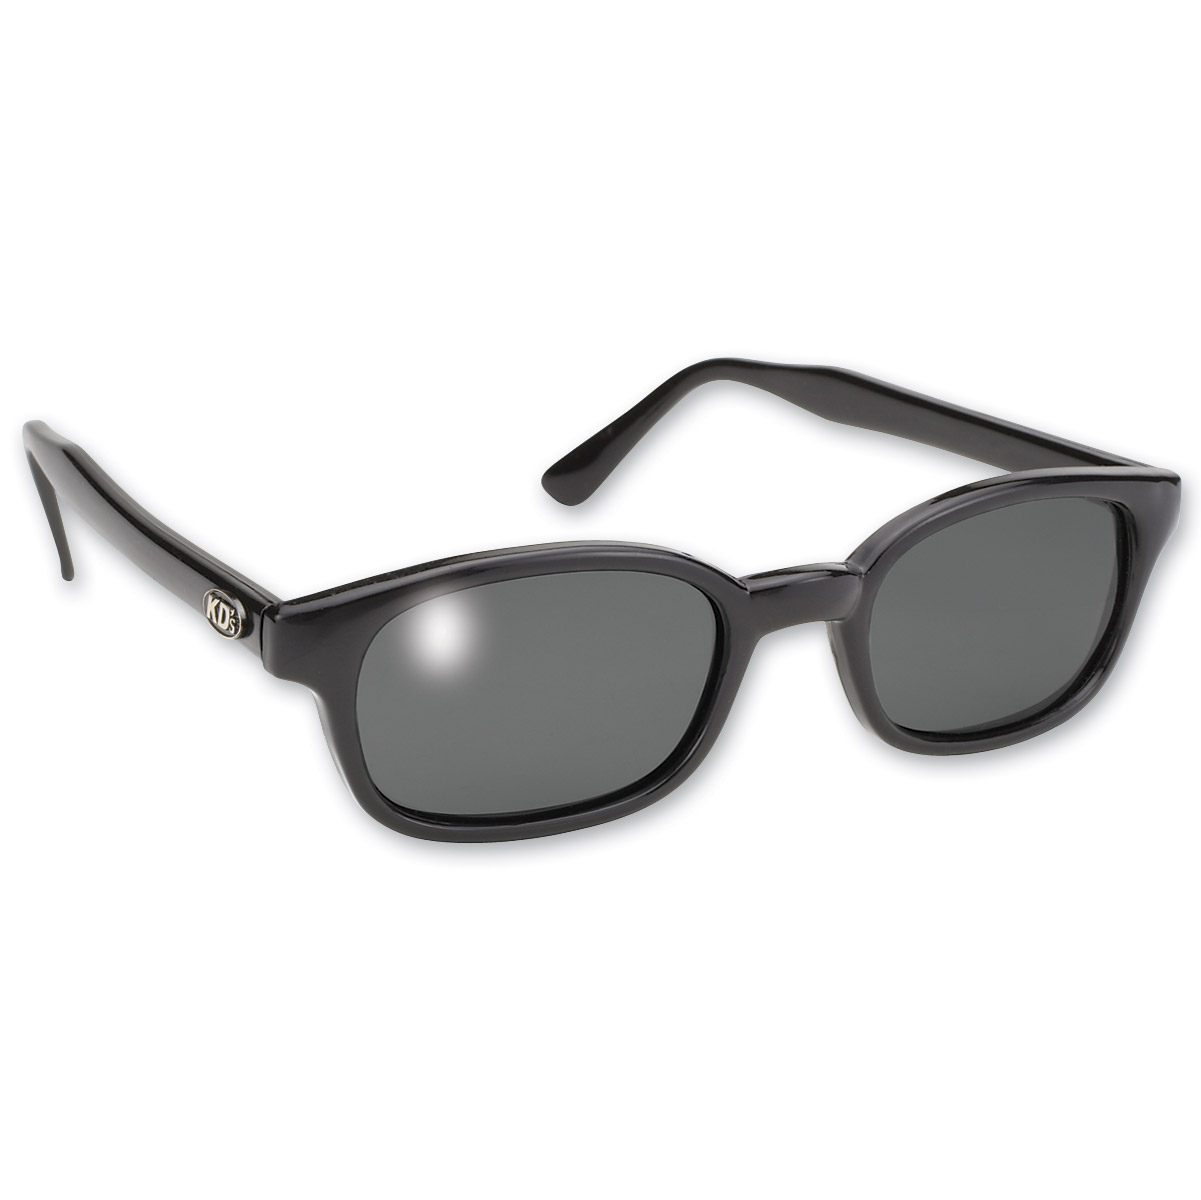 4863b25a071 Original KD s Polarized Sunglasses - 2019